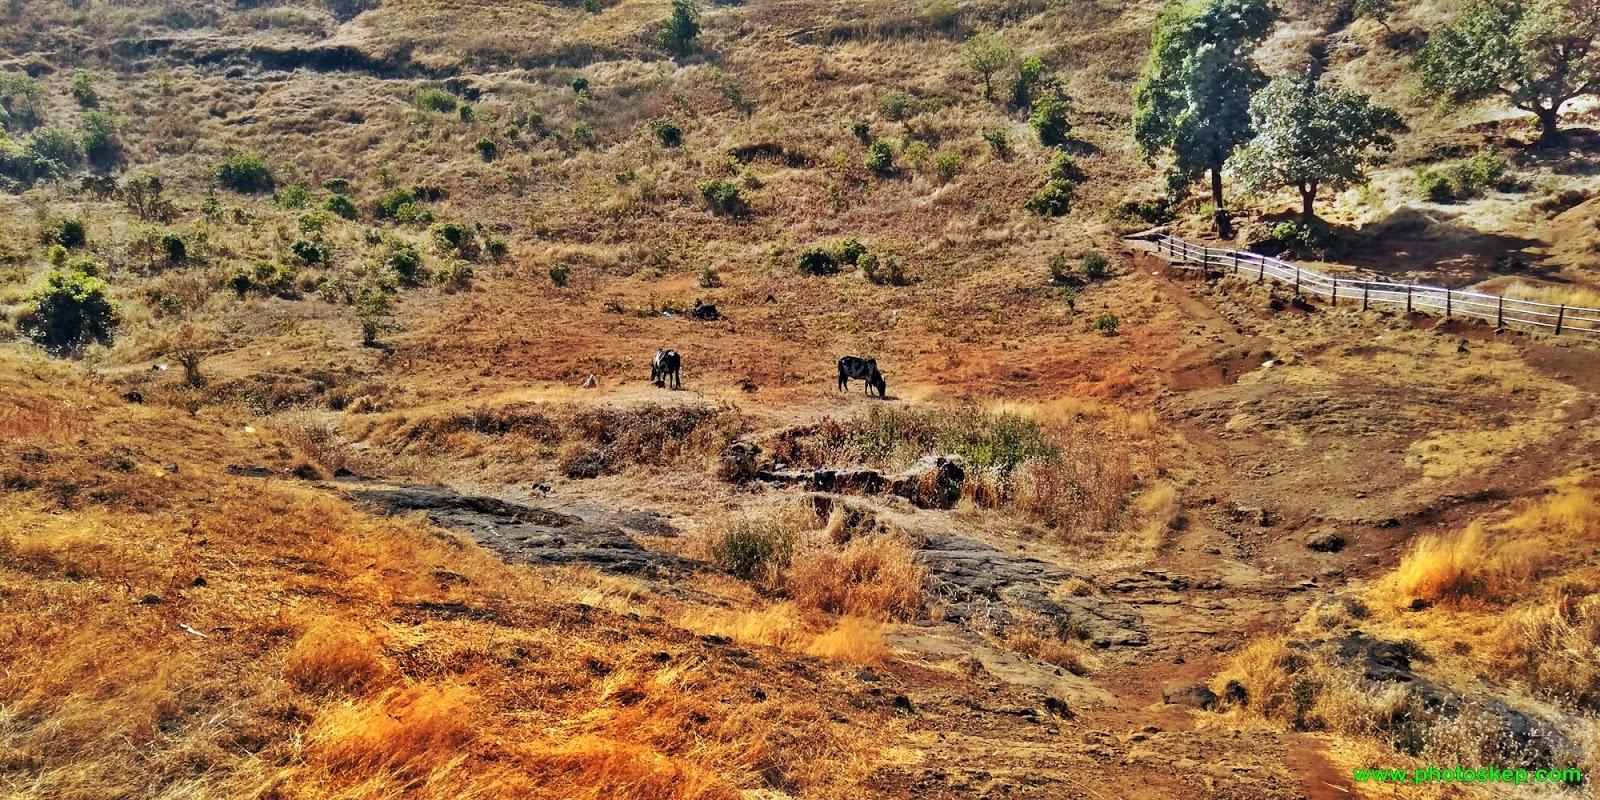 Brahmagiri - Brahmagiri parvat Hills and Mountains photos images free wallpaper